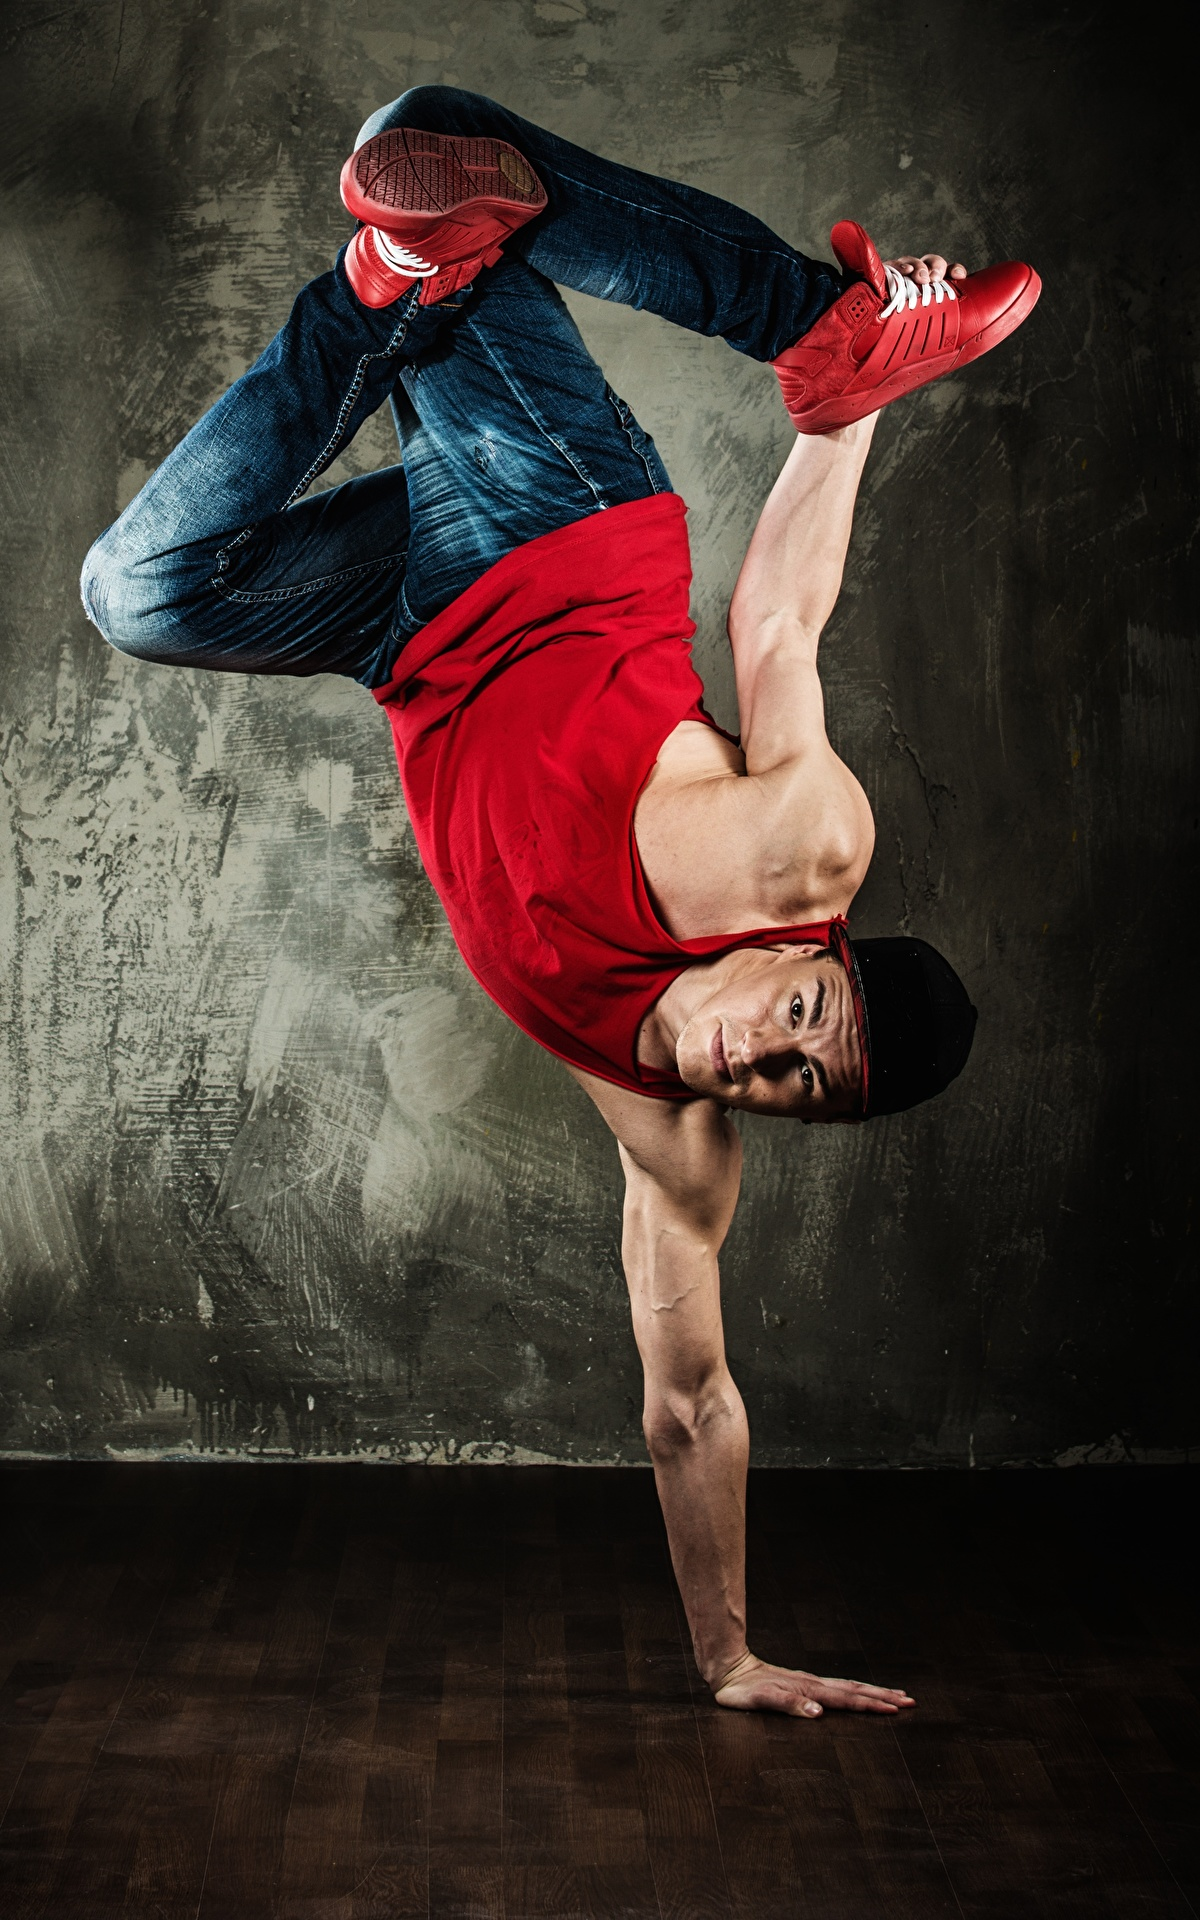 Фото Мужчины Танцует Майка Джинсы Руки 1200x1920 Танцы